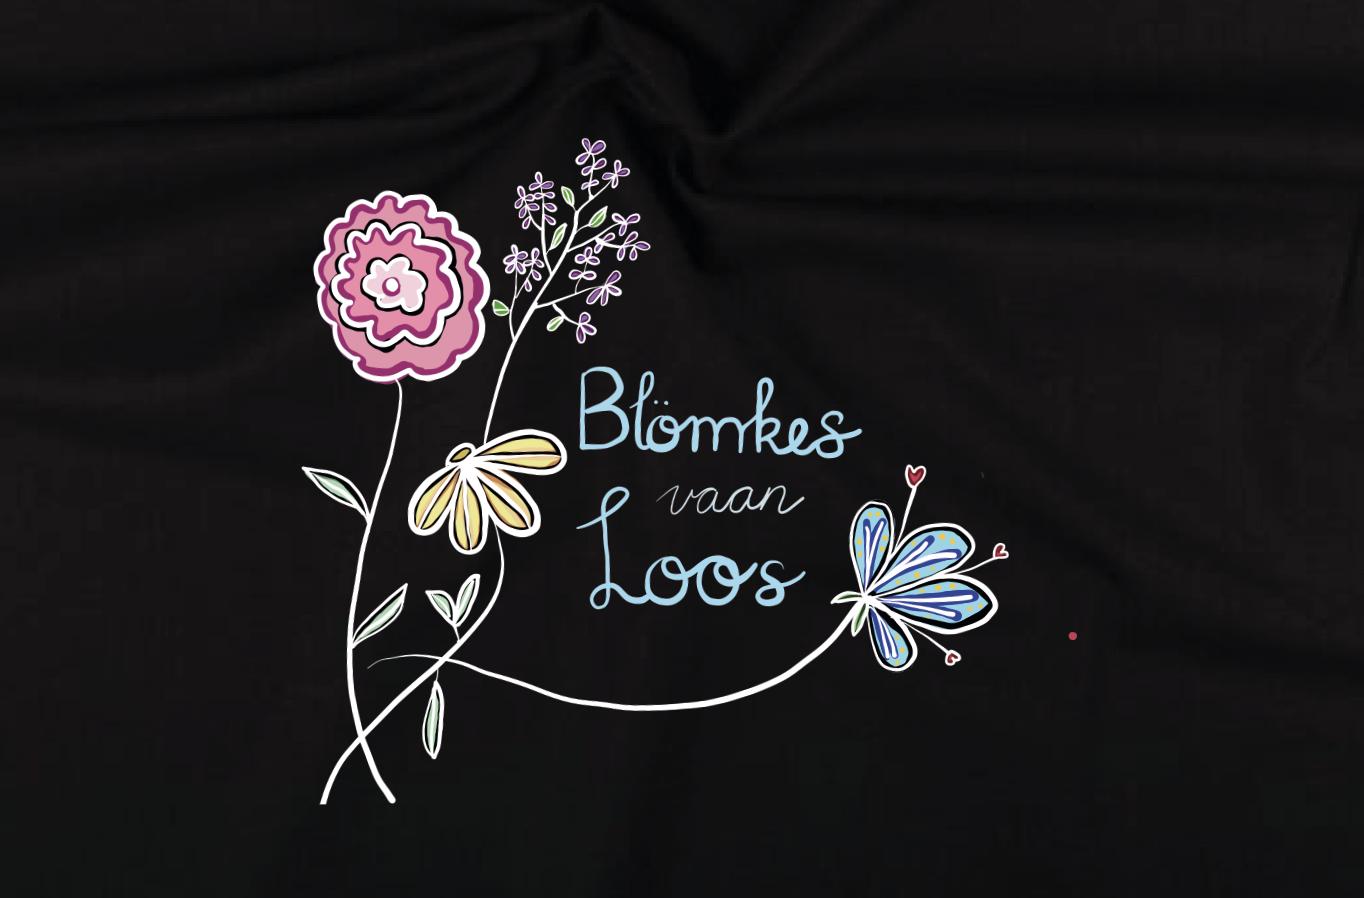 ILLUSTRATIE - Bloemenhandel Honoré Loos